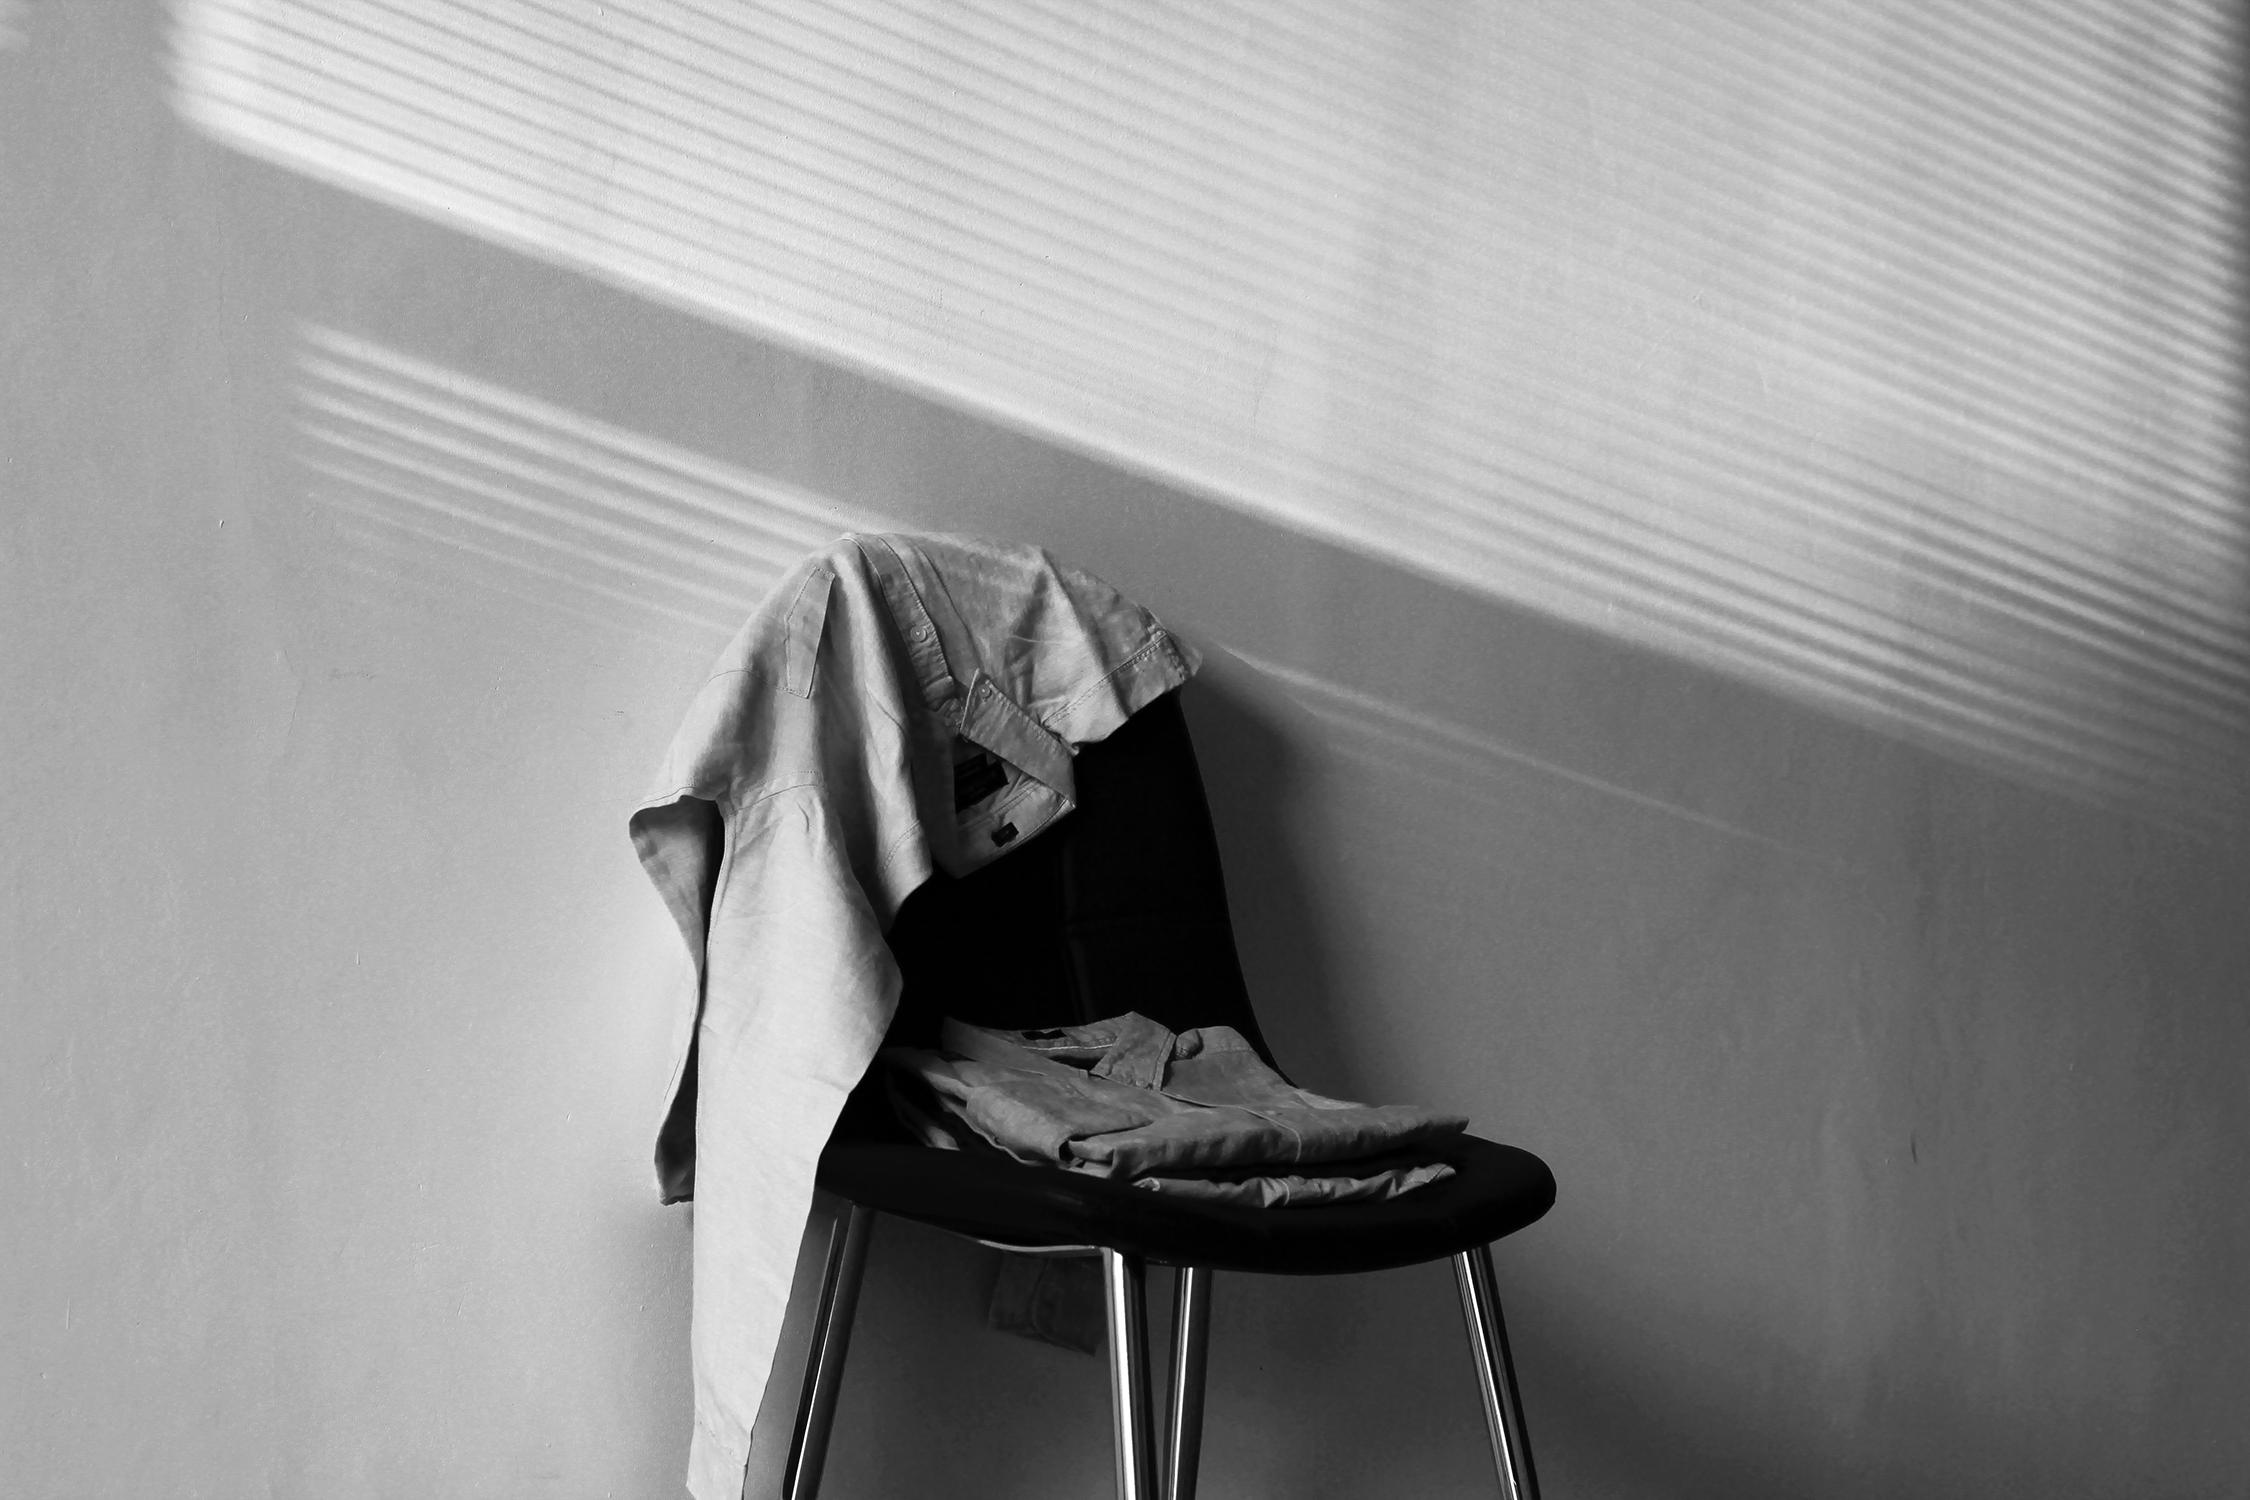 Одежда на стуле картинки